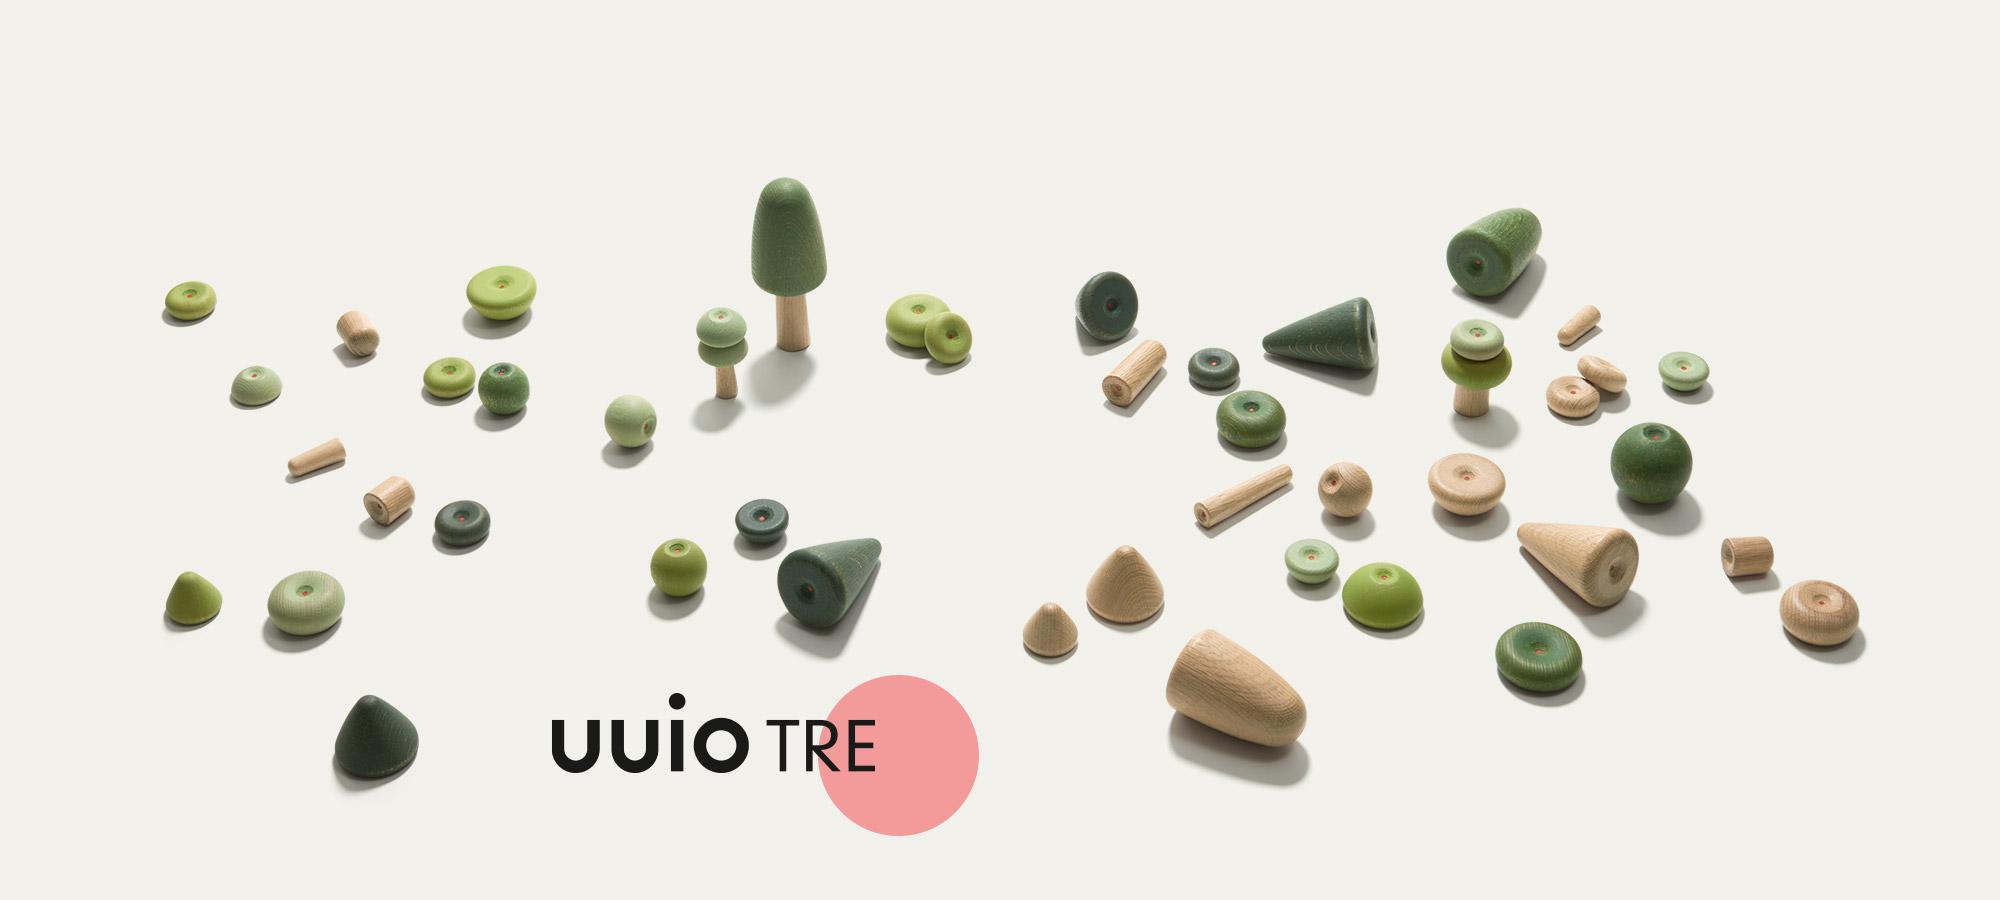 uuio_TRE_overview_panoramic